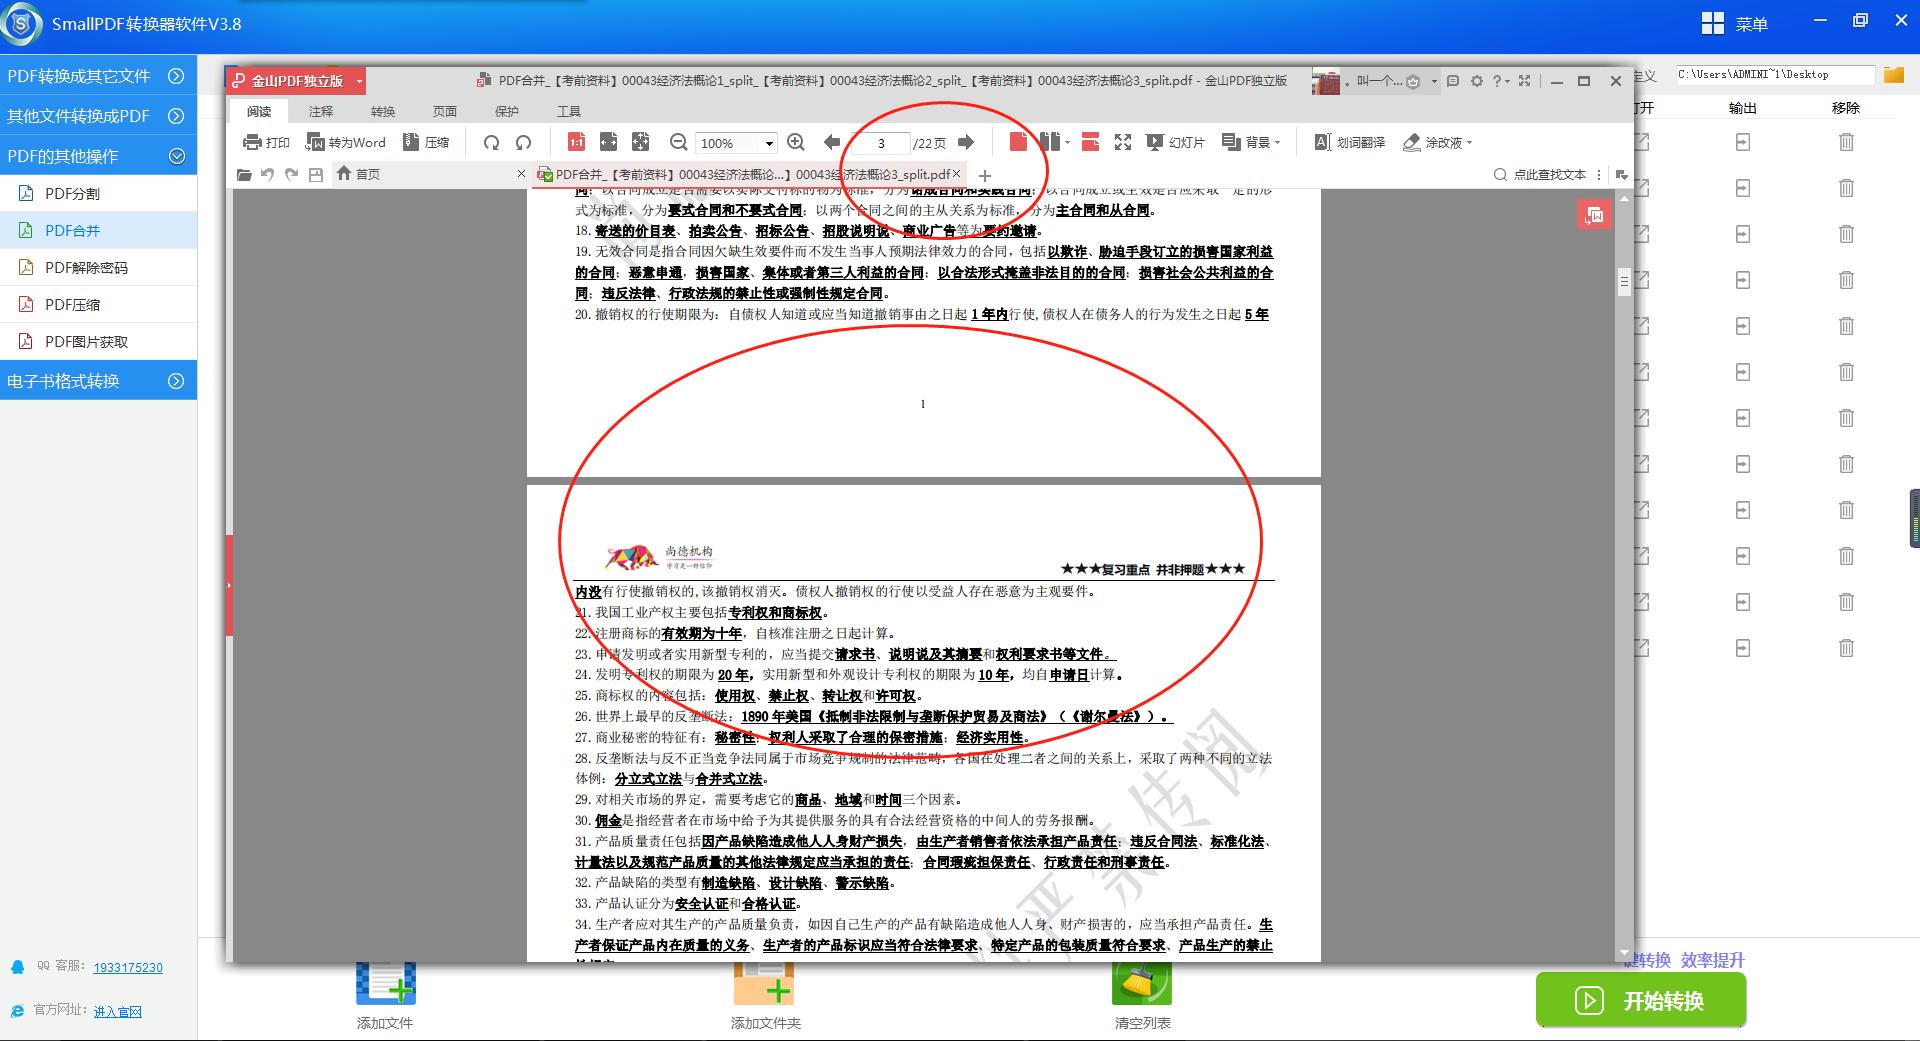 smallpdf转换器软件V3.8的PDF合并操作流程-5